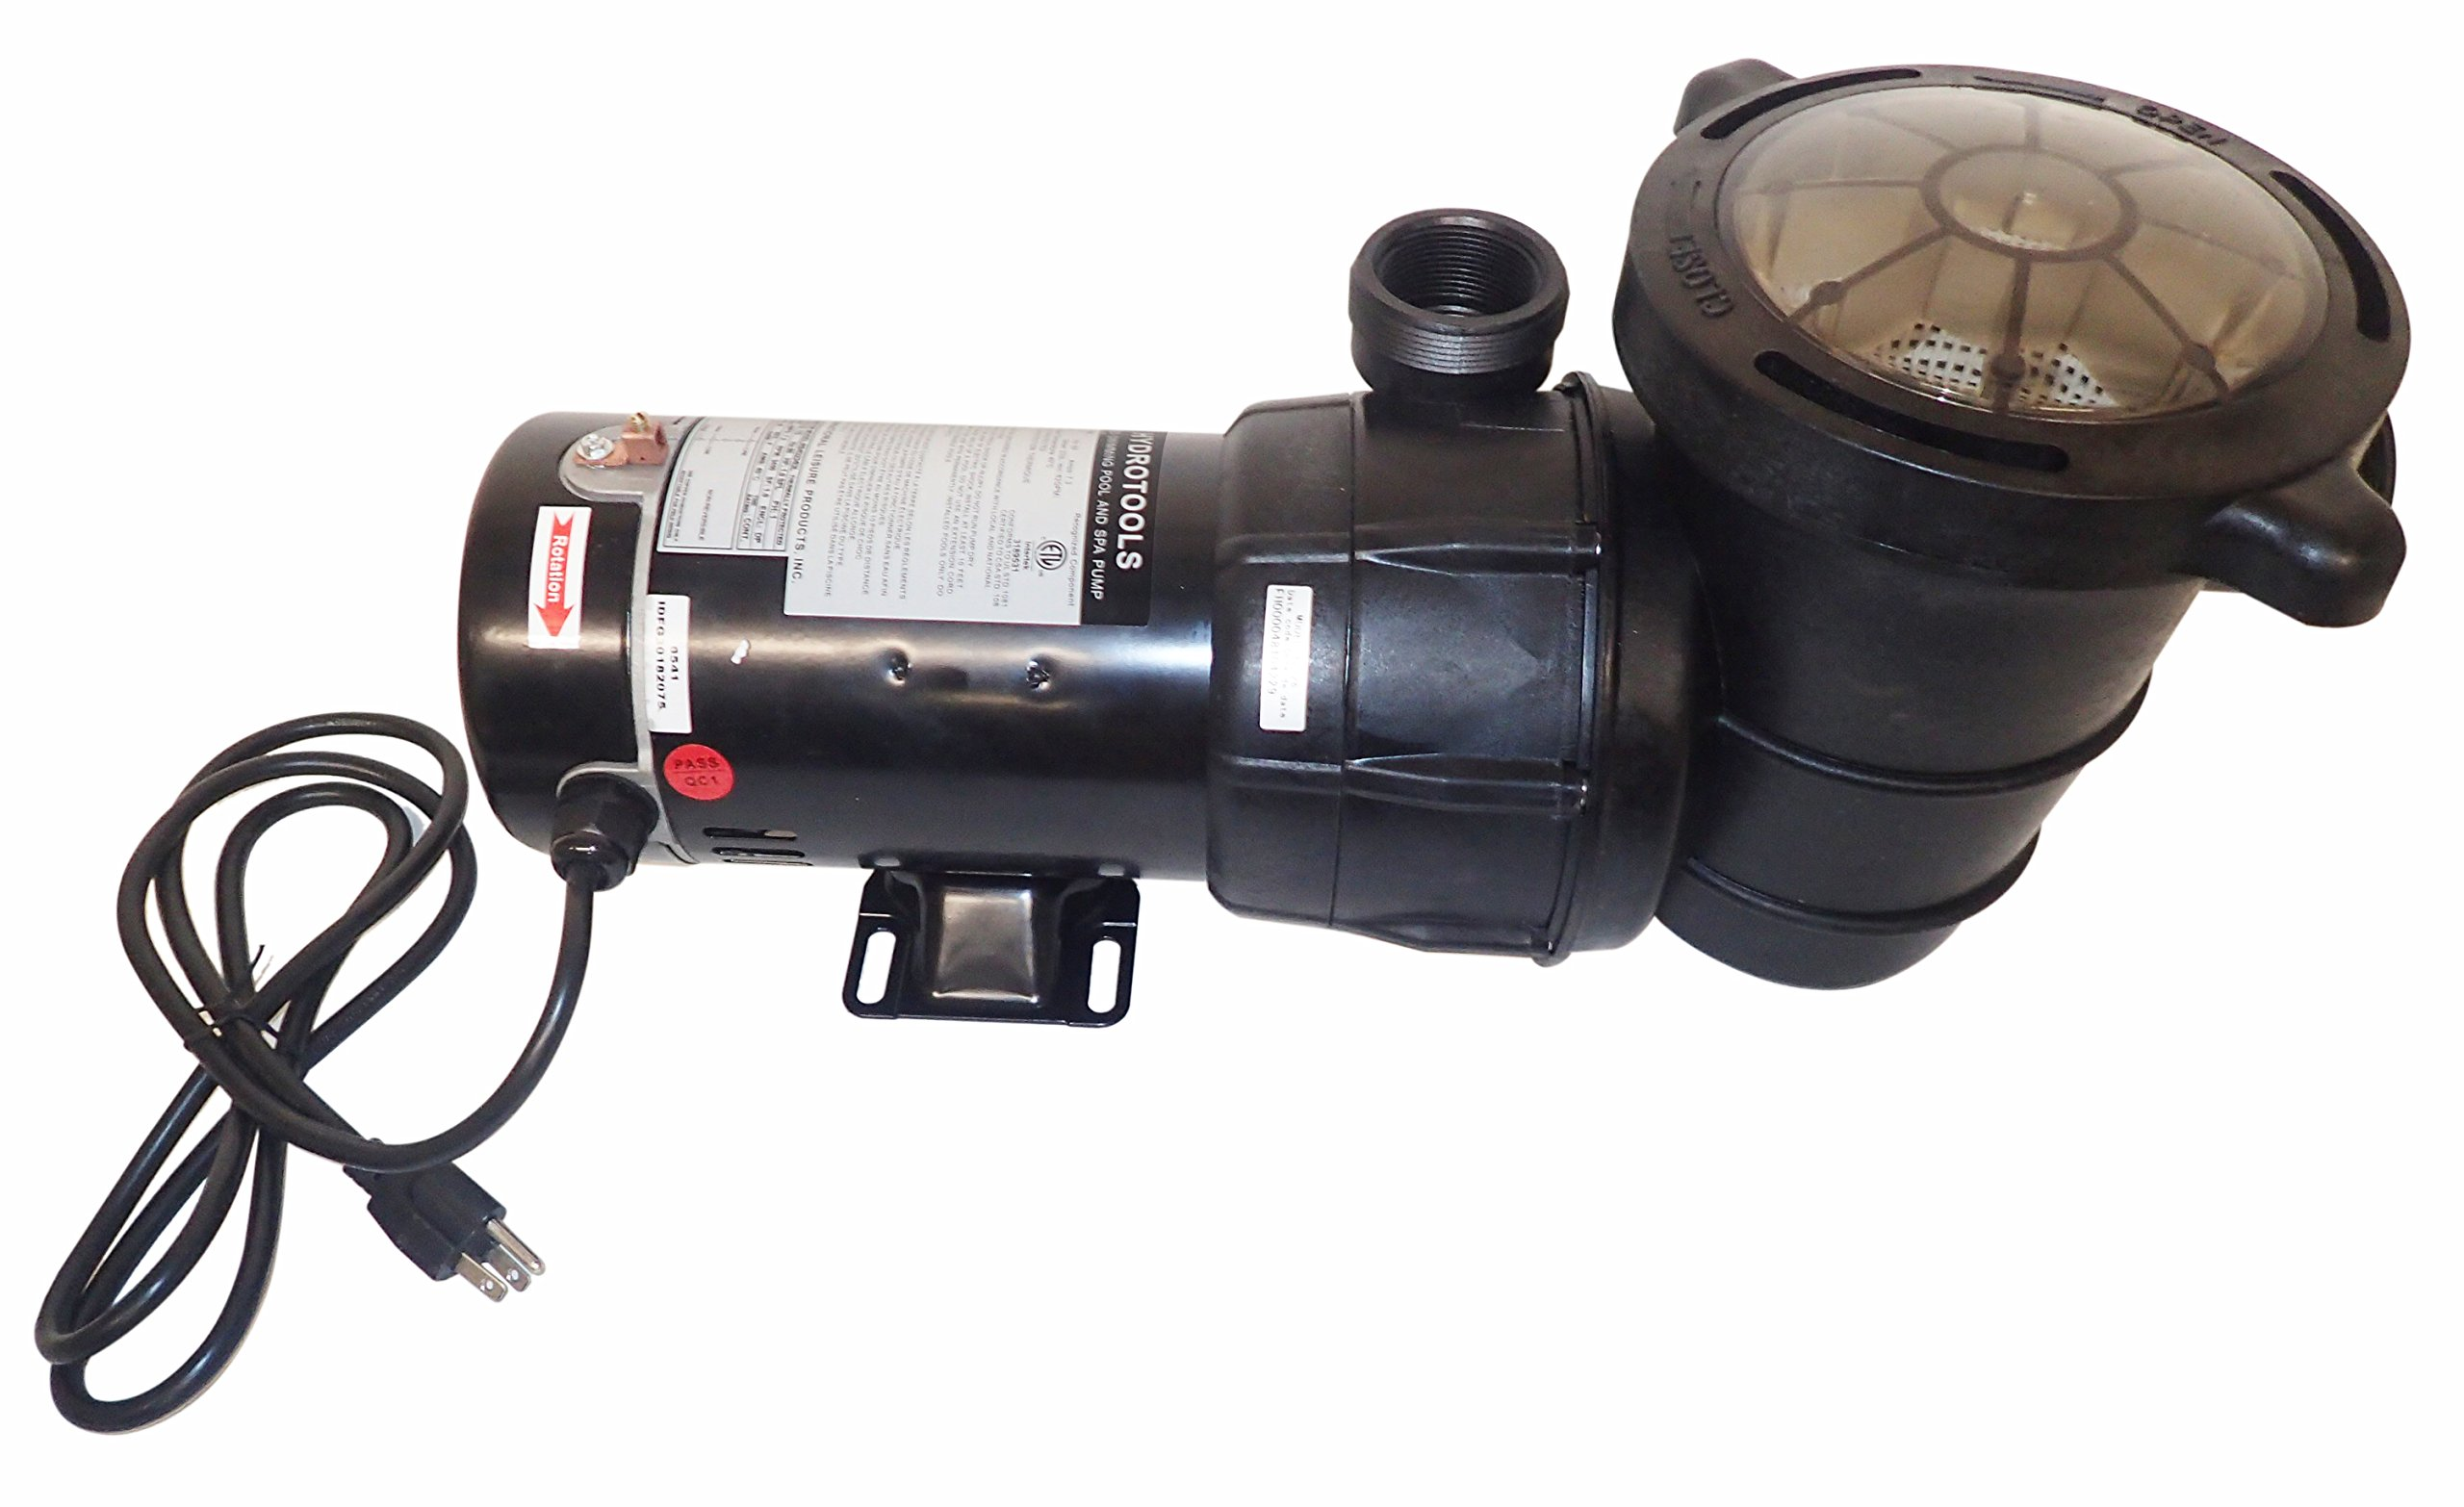 Swimline 1.0 hp Pool Pump